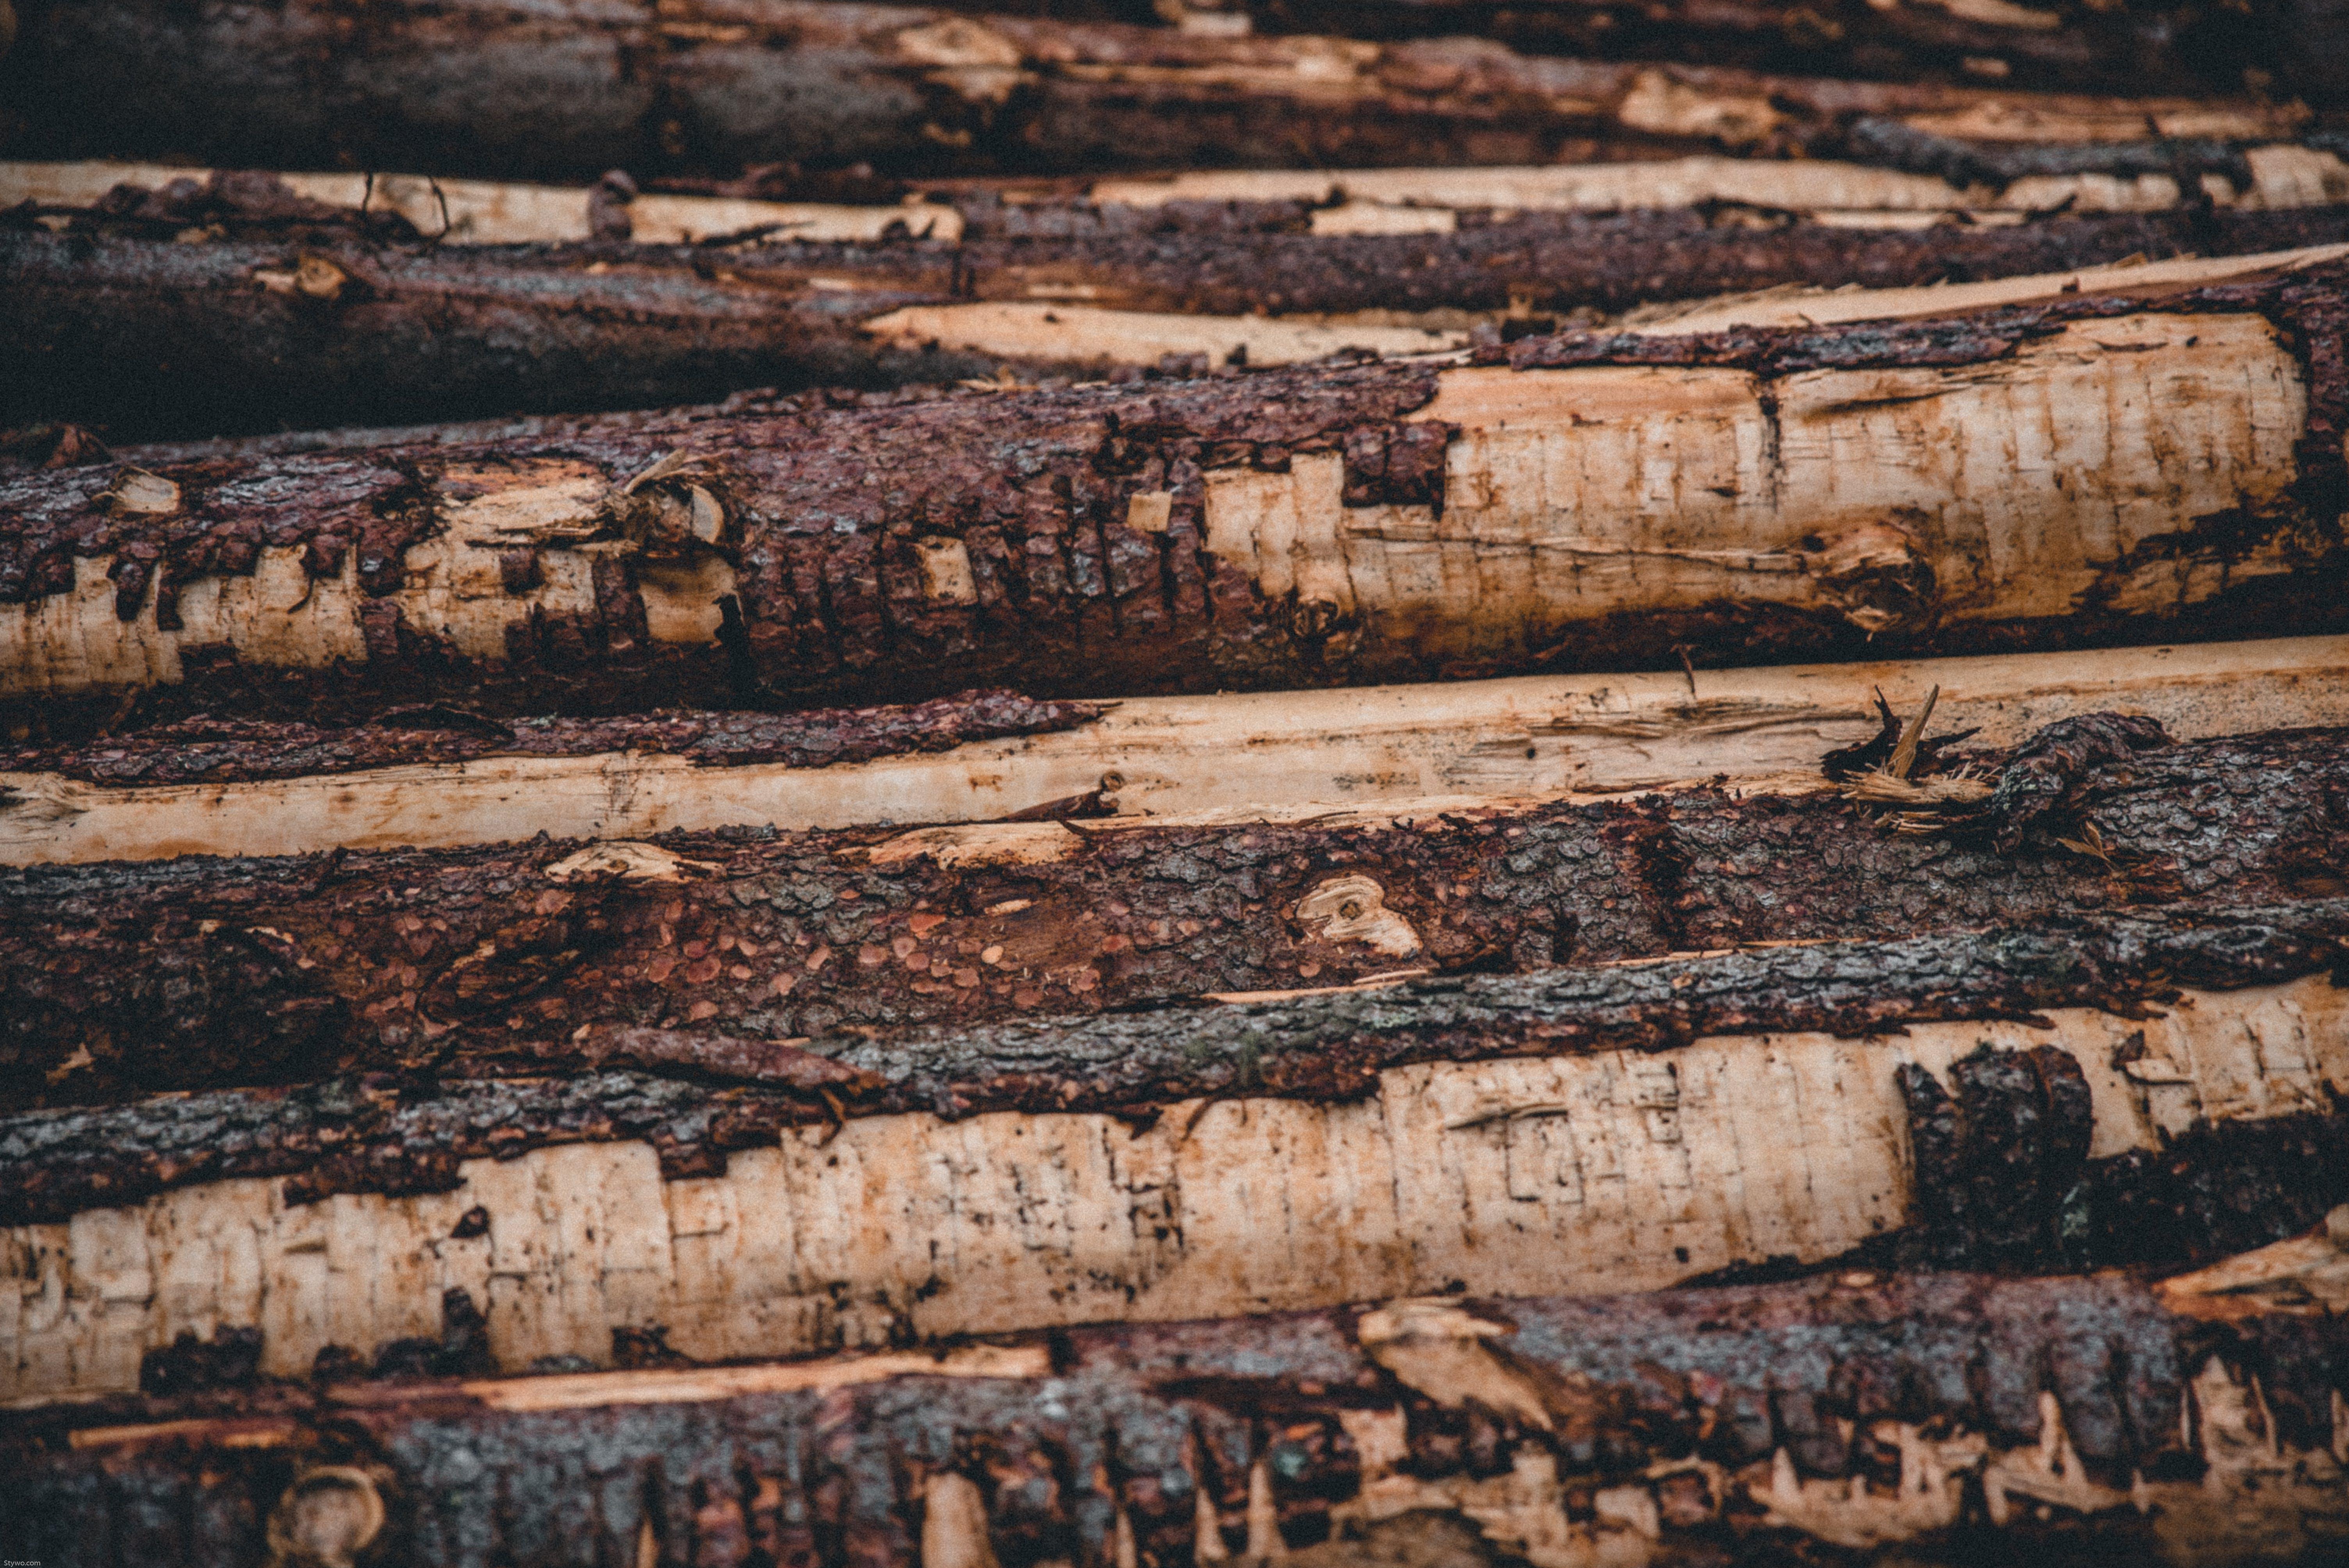 Piled Brown Tree Logs